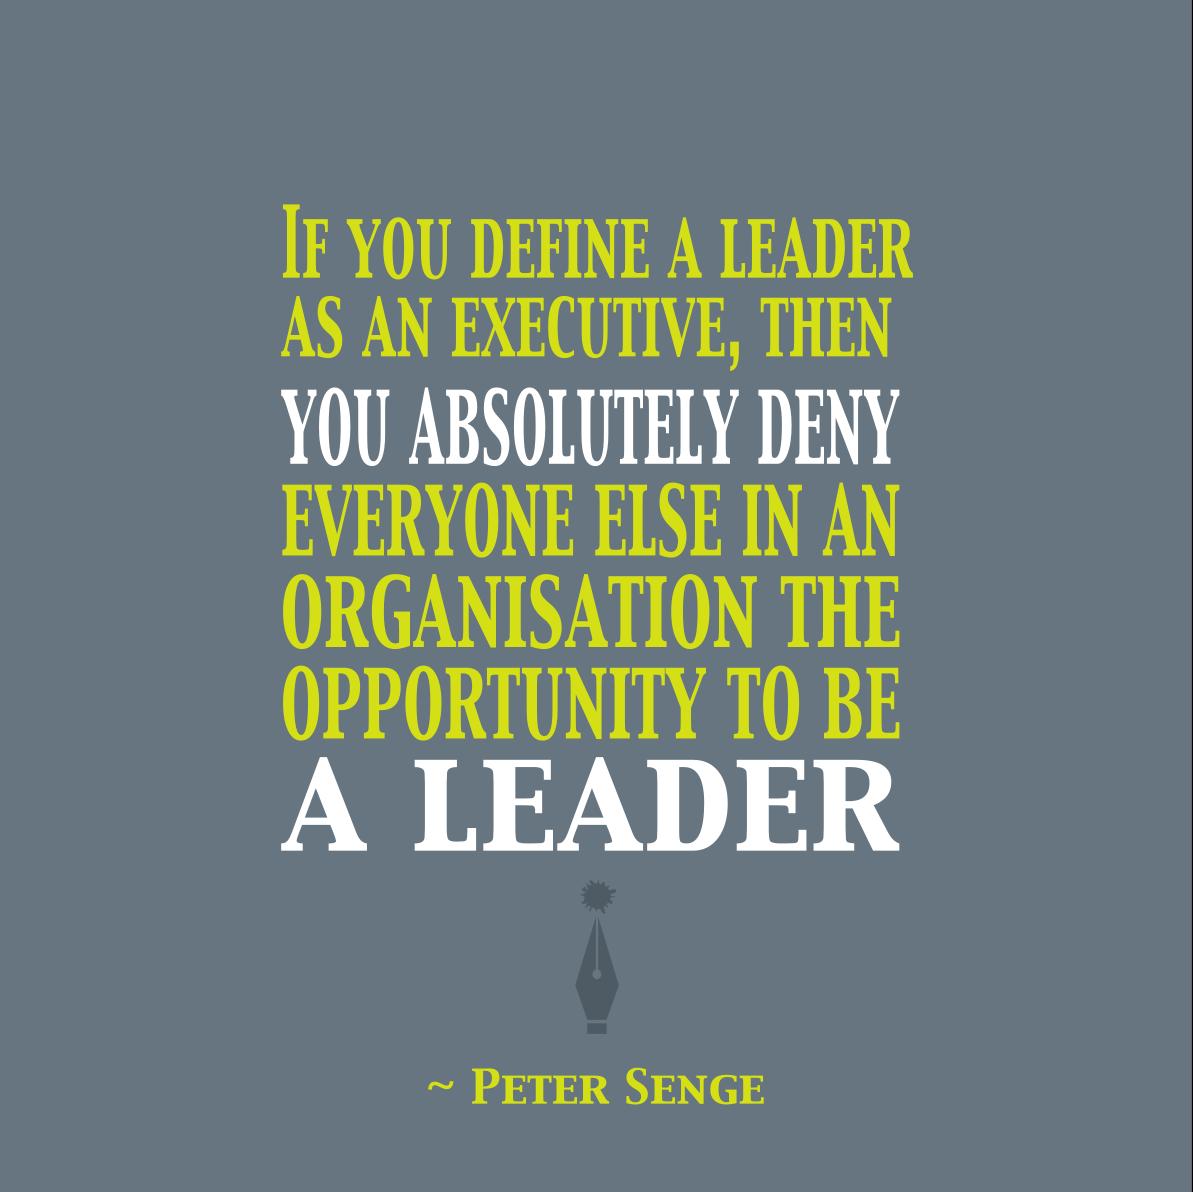 Peter Senge quote